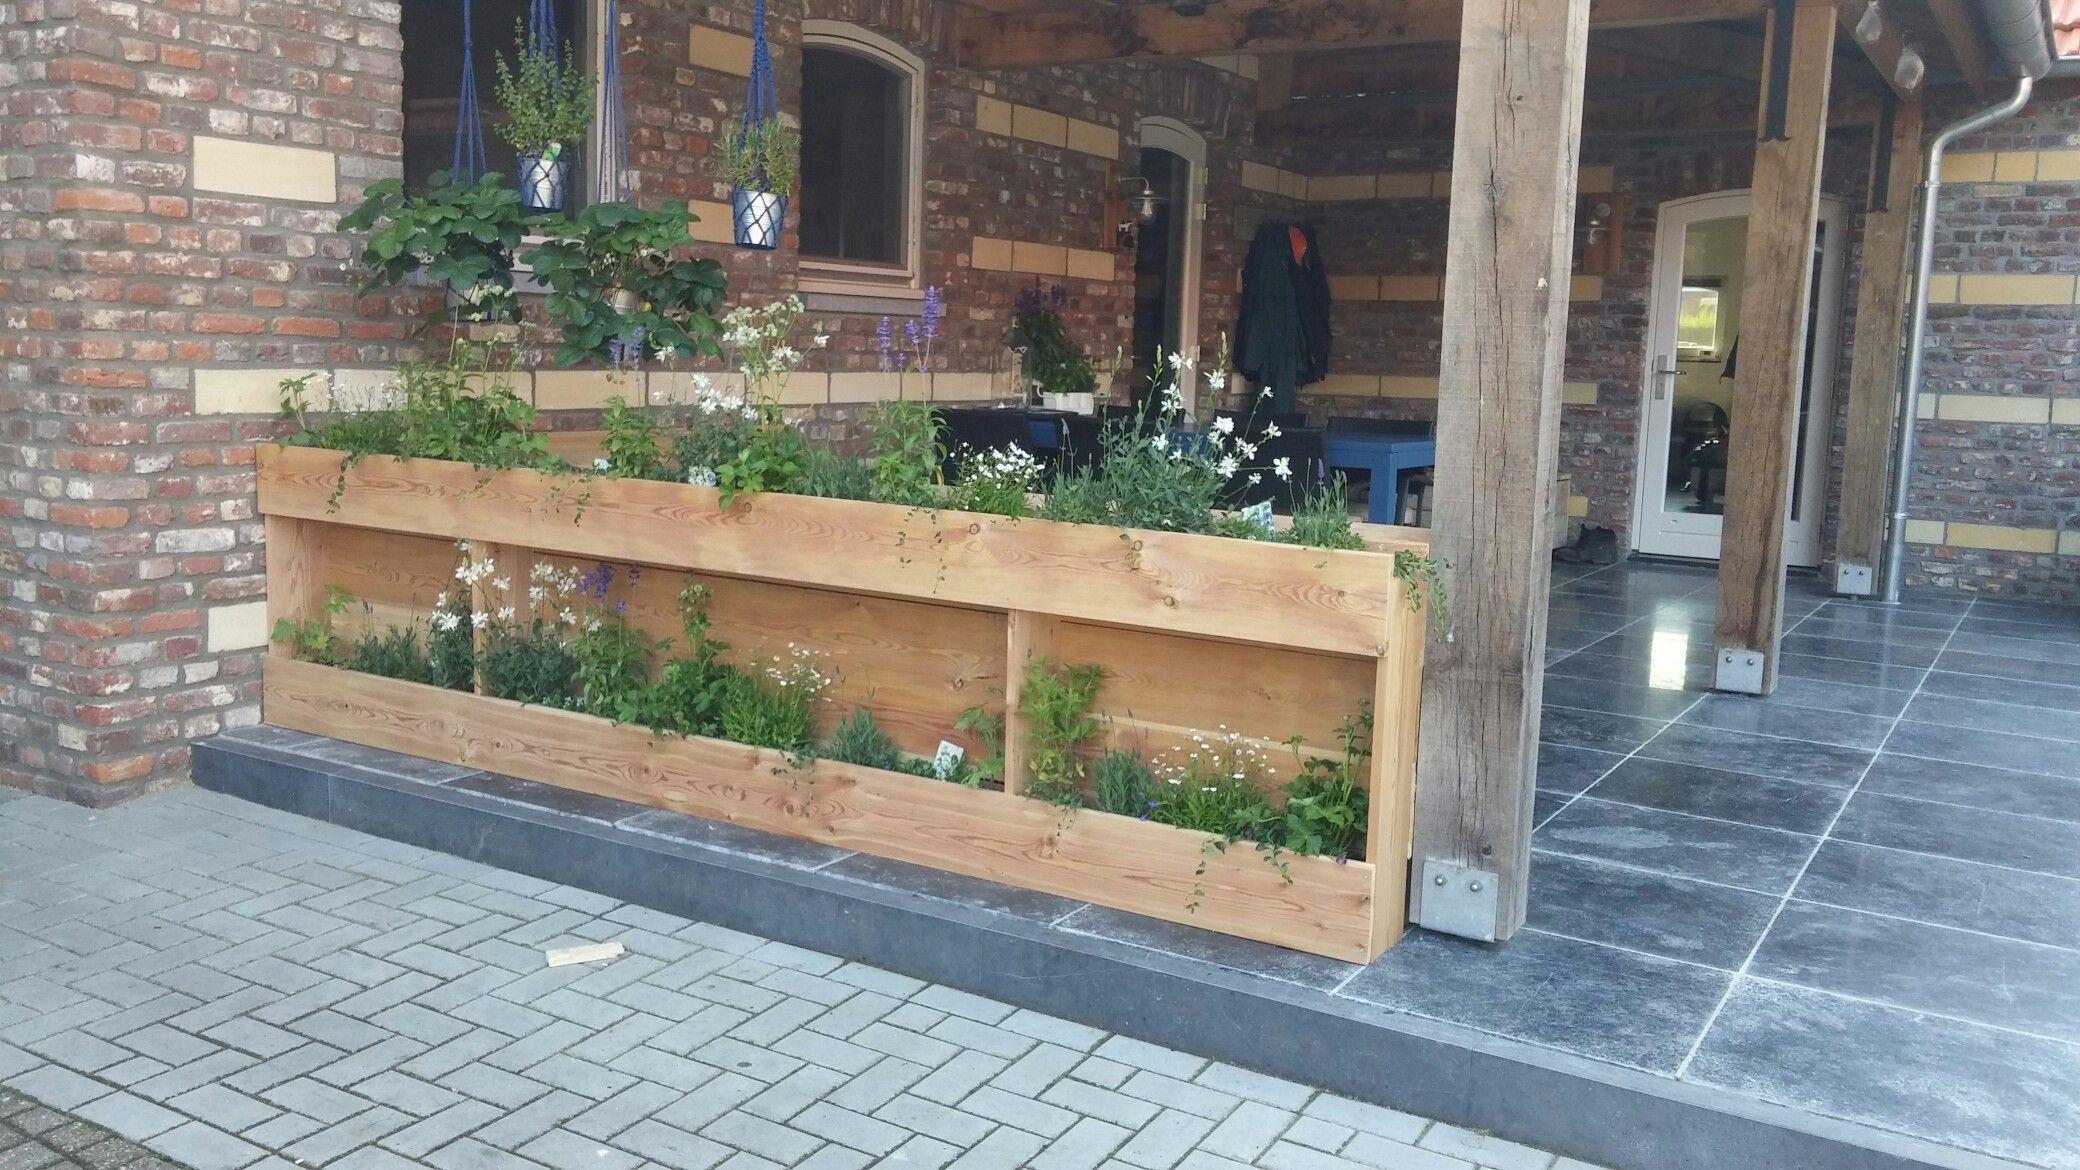 Bloemenbak achterkant tuinbank hoekbank